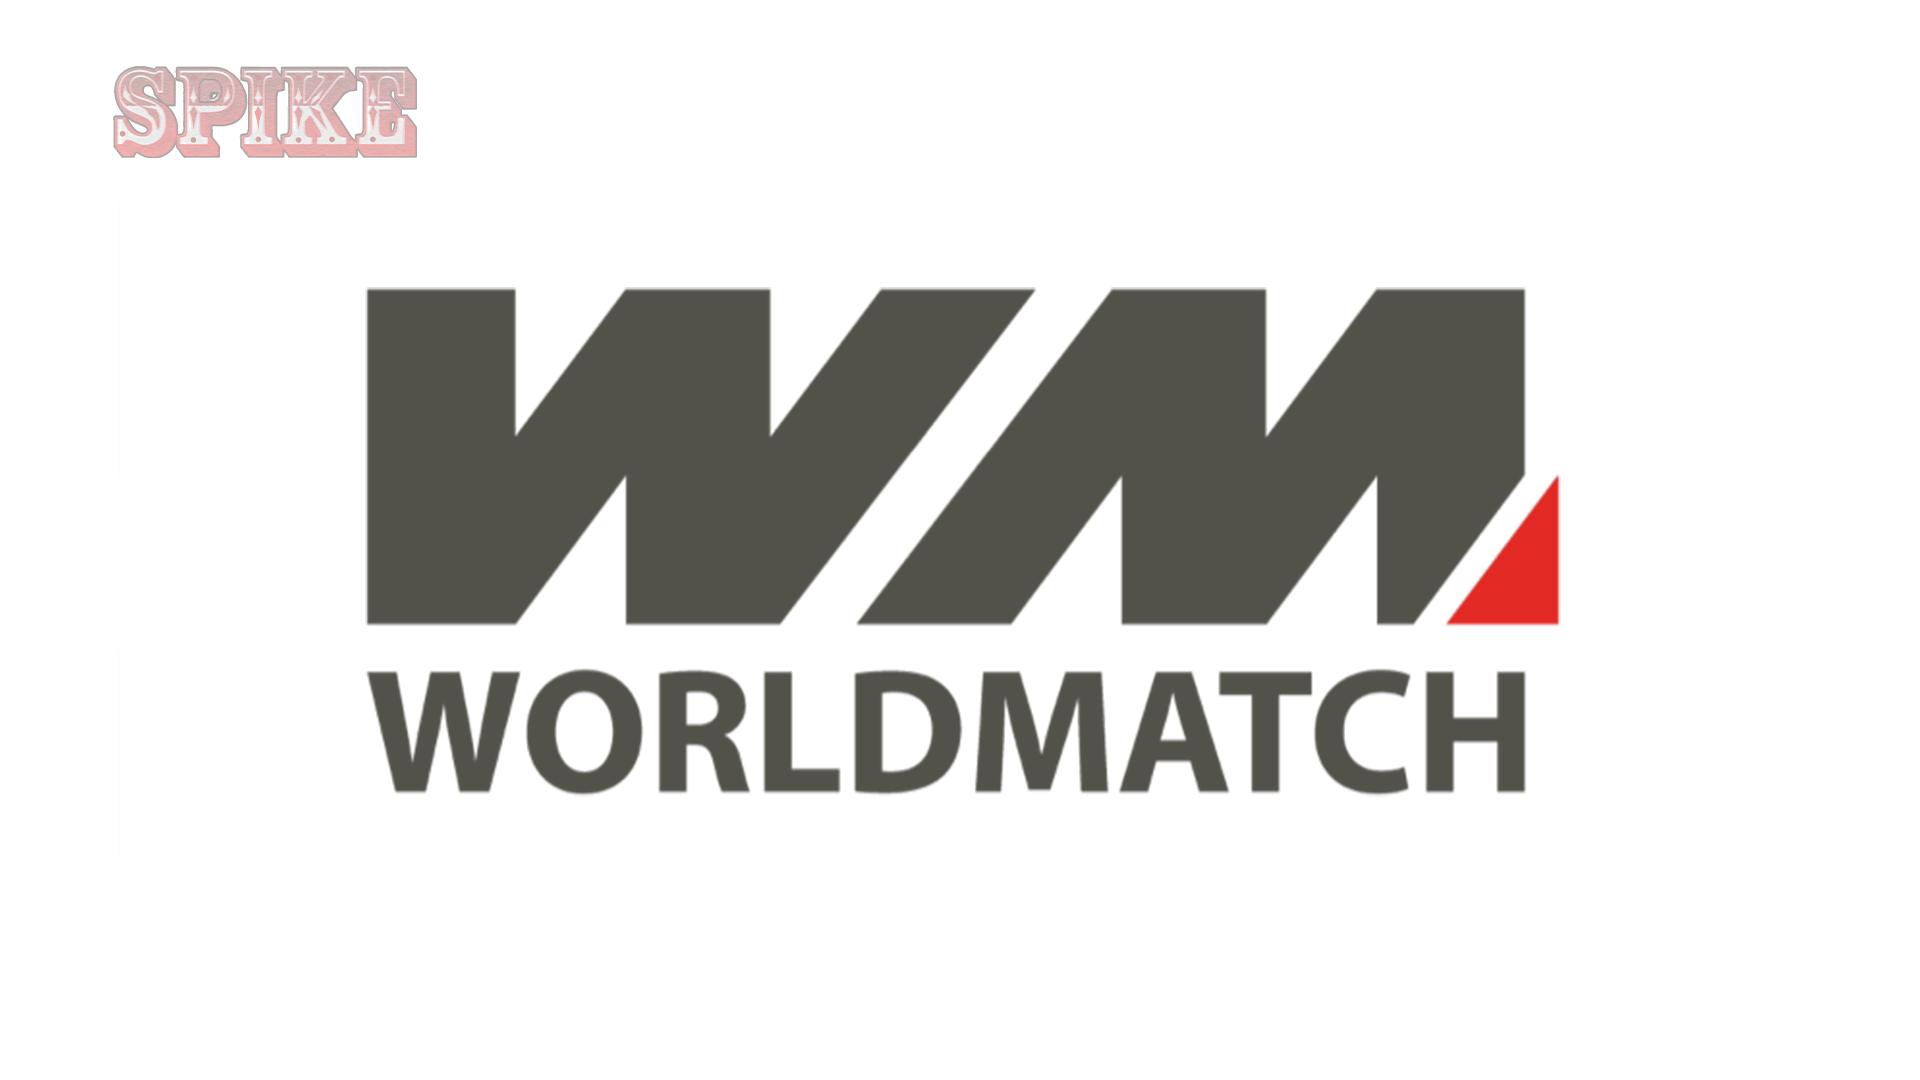 worldmatch producer free demo online slot